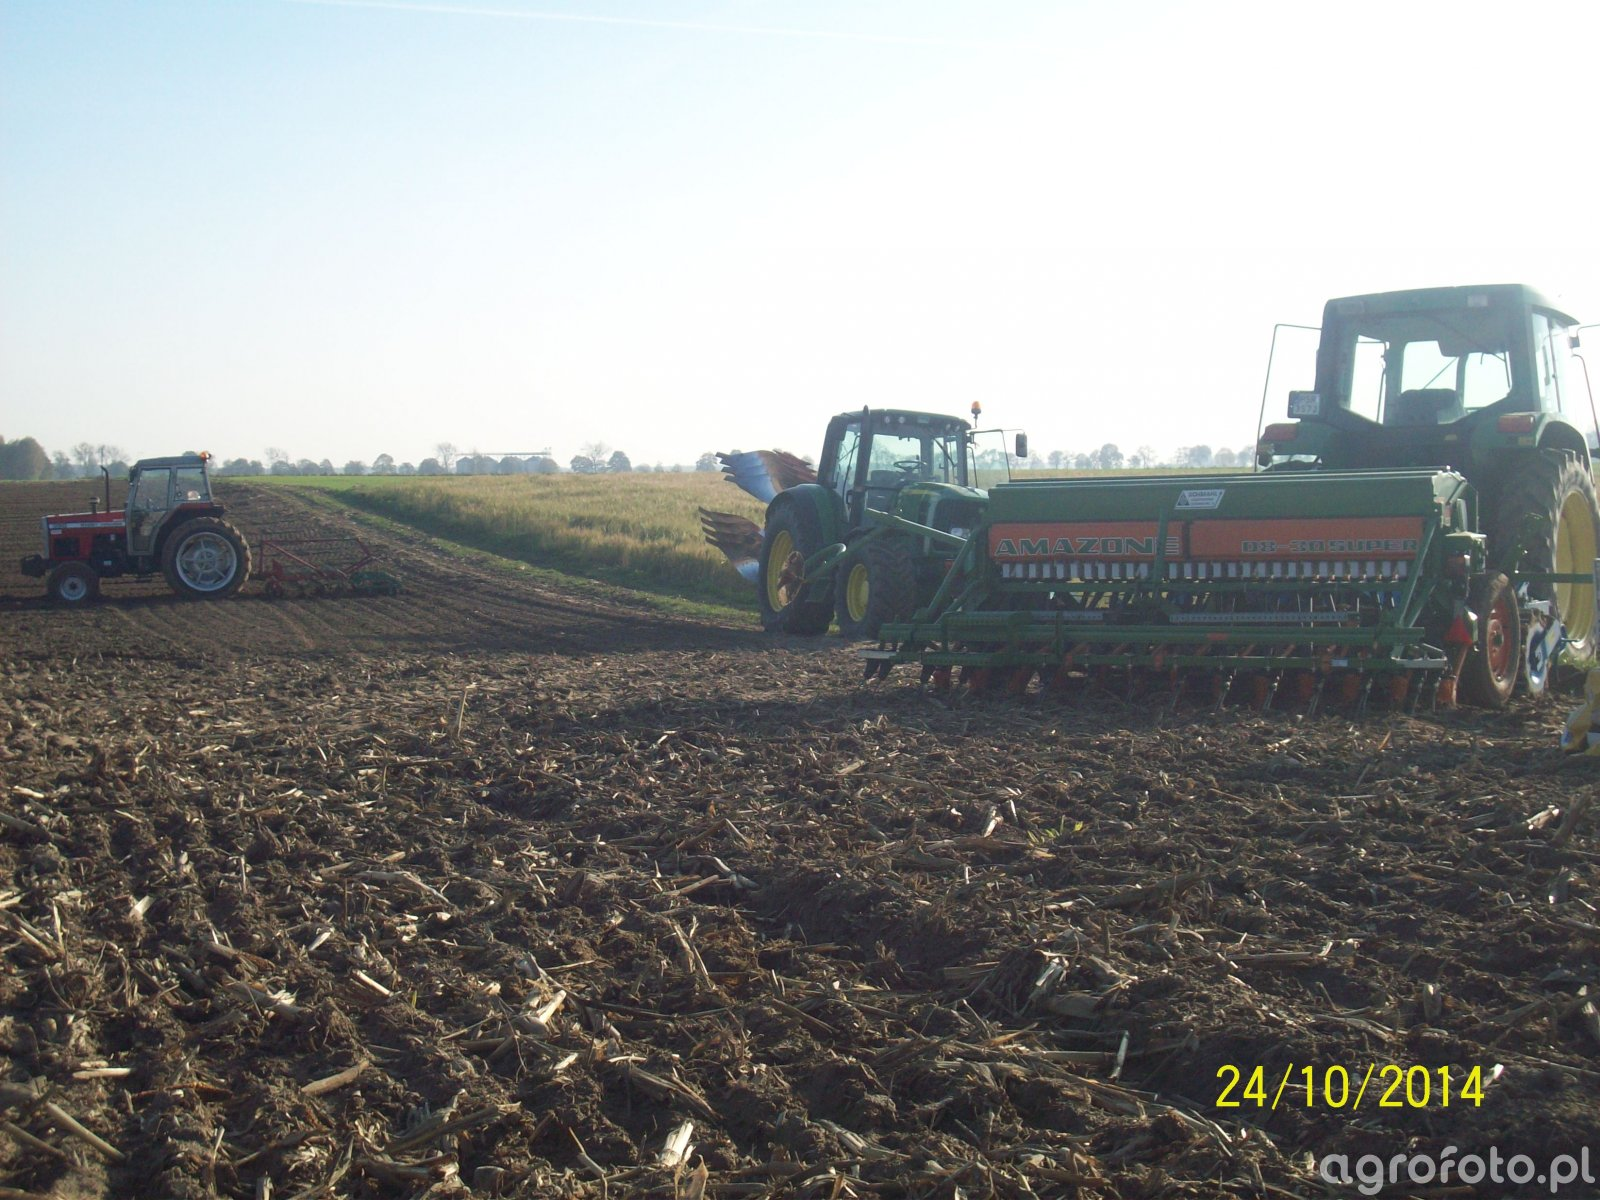 John Deere 6200 & Zestaw uprawowo-siewny & John Deere 6630 & KUHN multimaster 112 & Mf 390 & Brony